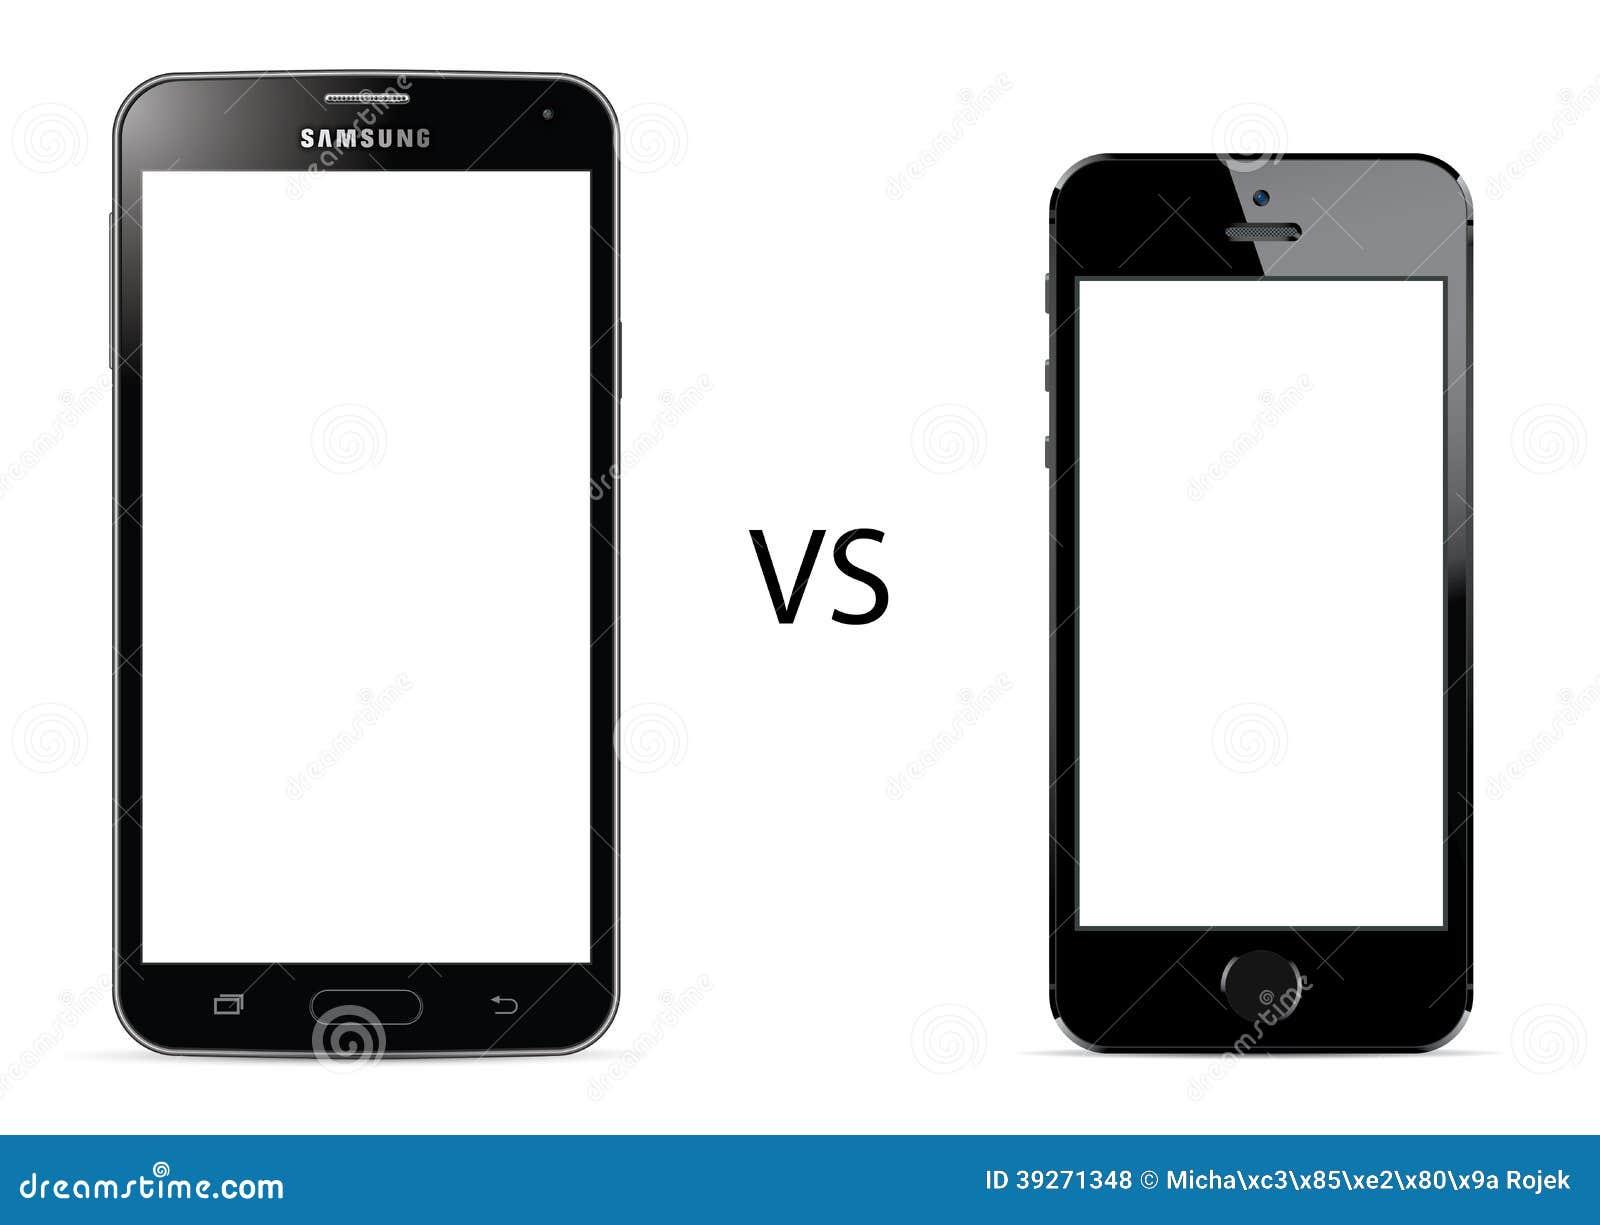 Samsung-Melkweg S5 versus Apple-iPhone 5s